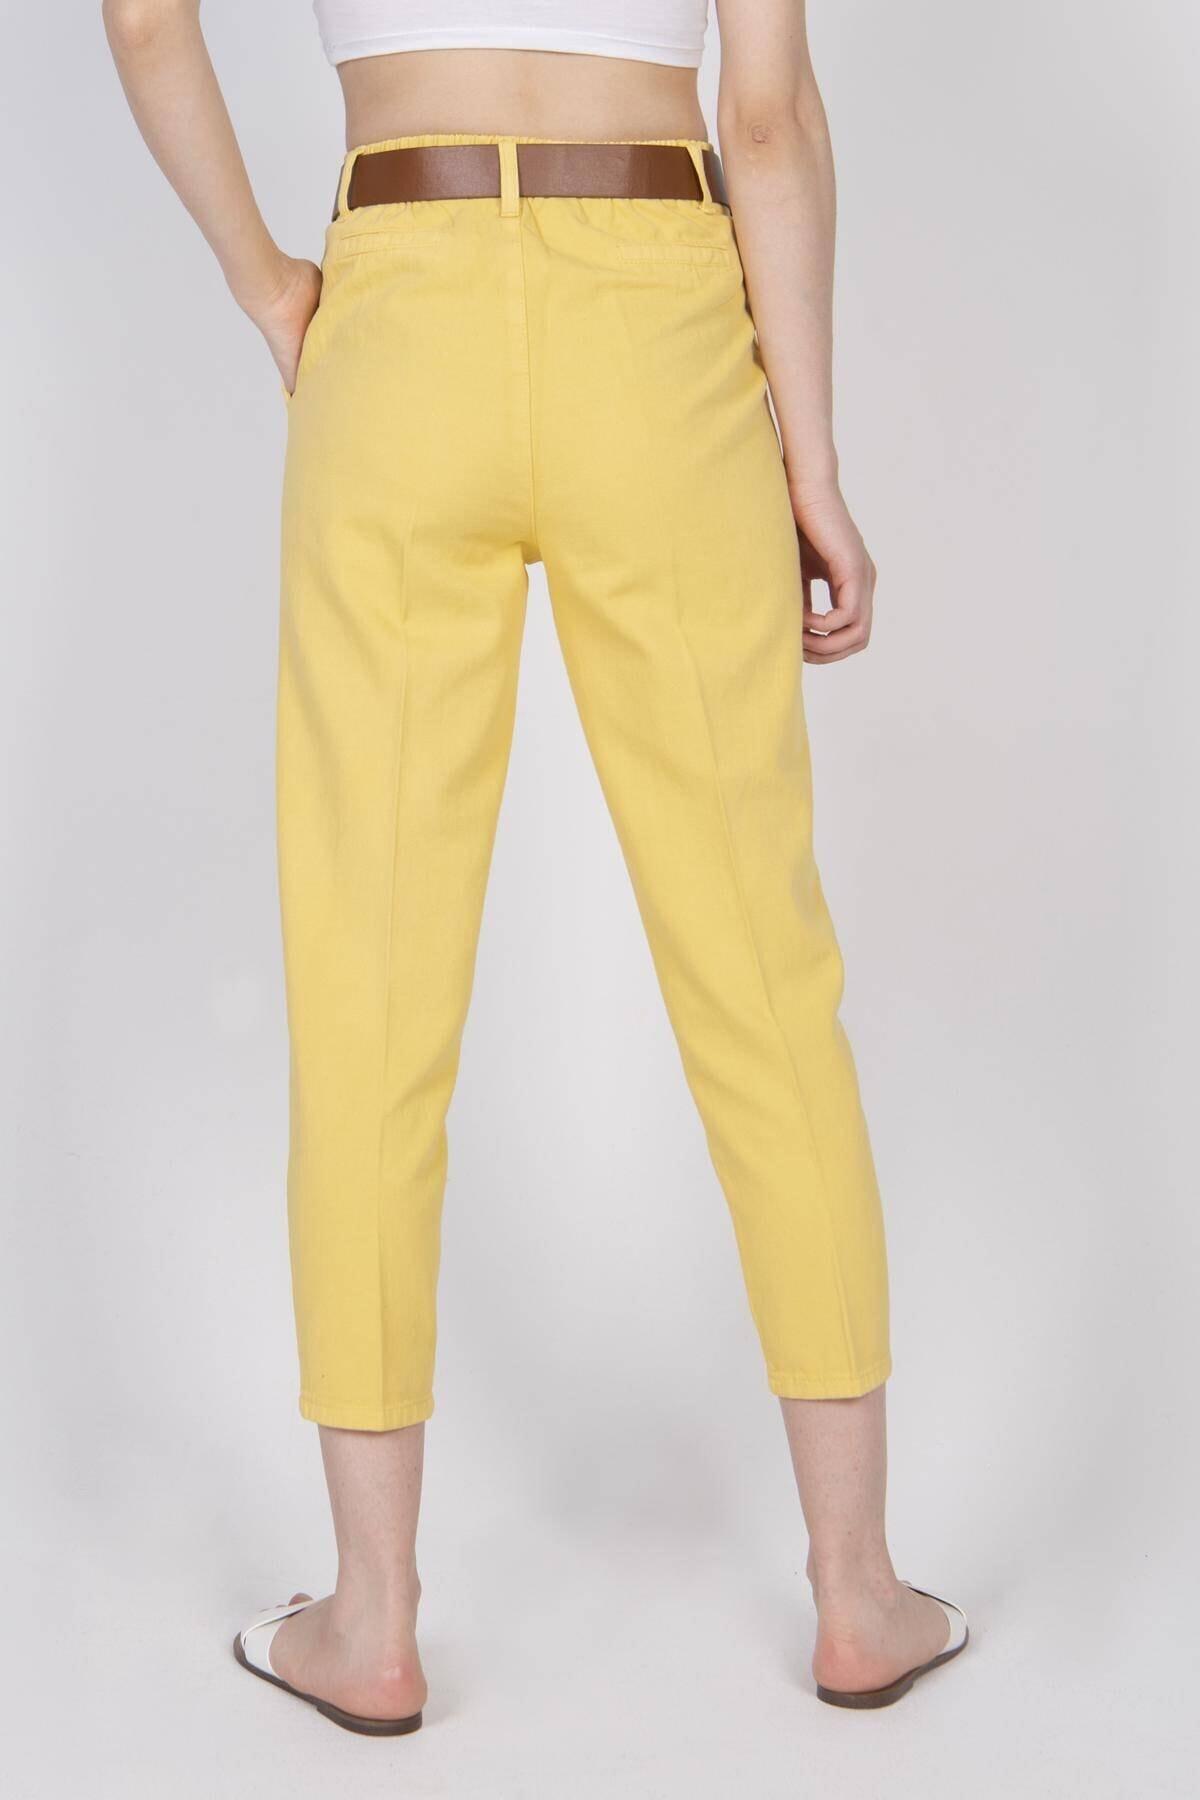 Addax Kadın Sarı Kemerli Pantolon PN4204 - T3 ADX-0000020952 4